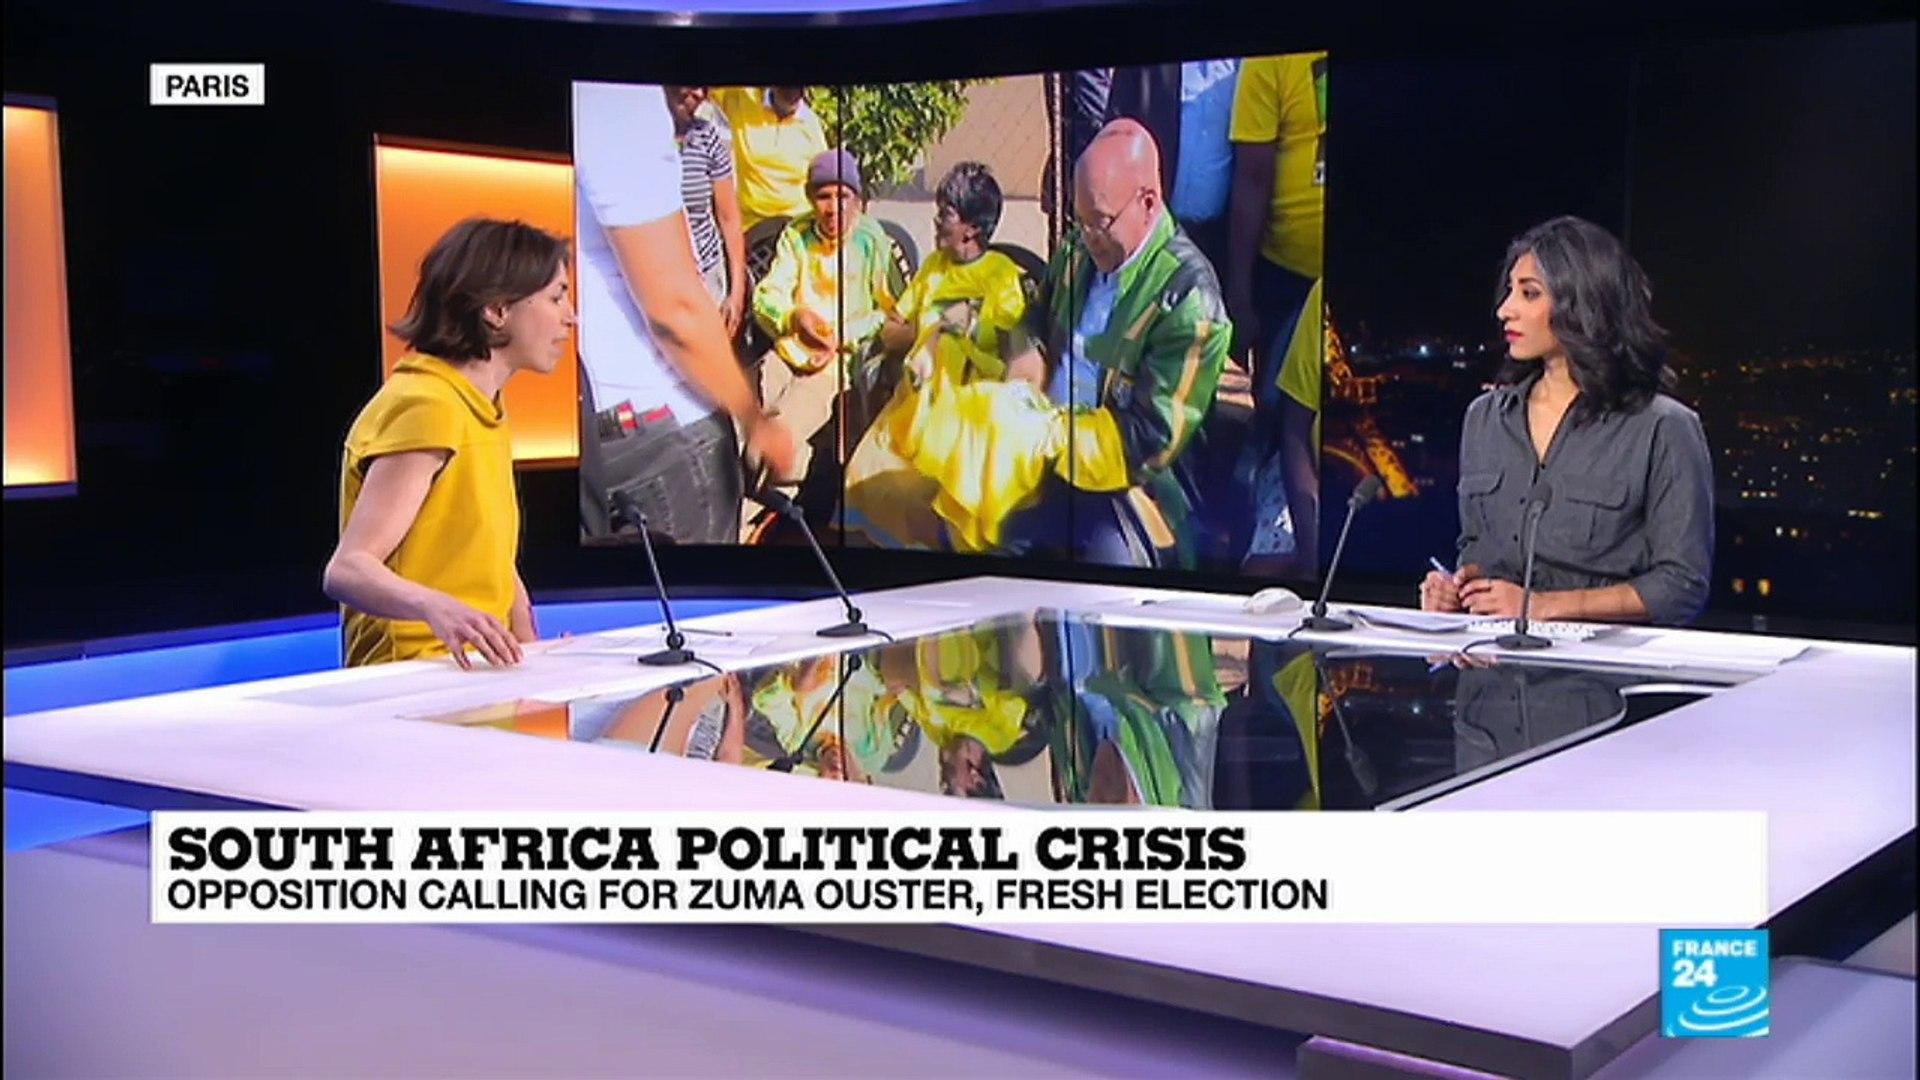 Three scenarios to end South Africa''s political crisis